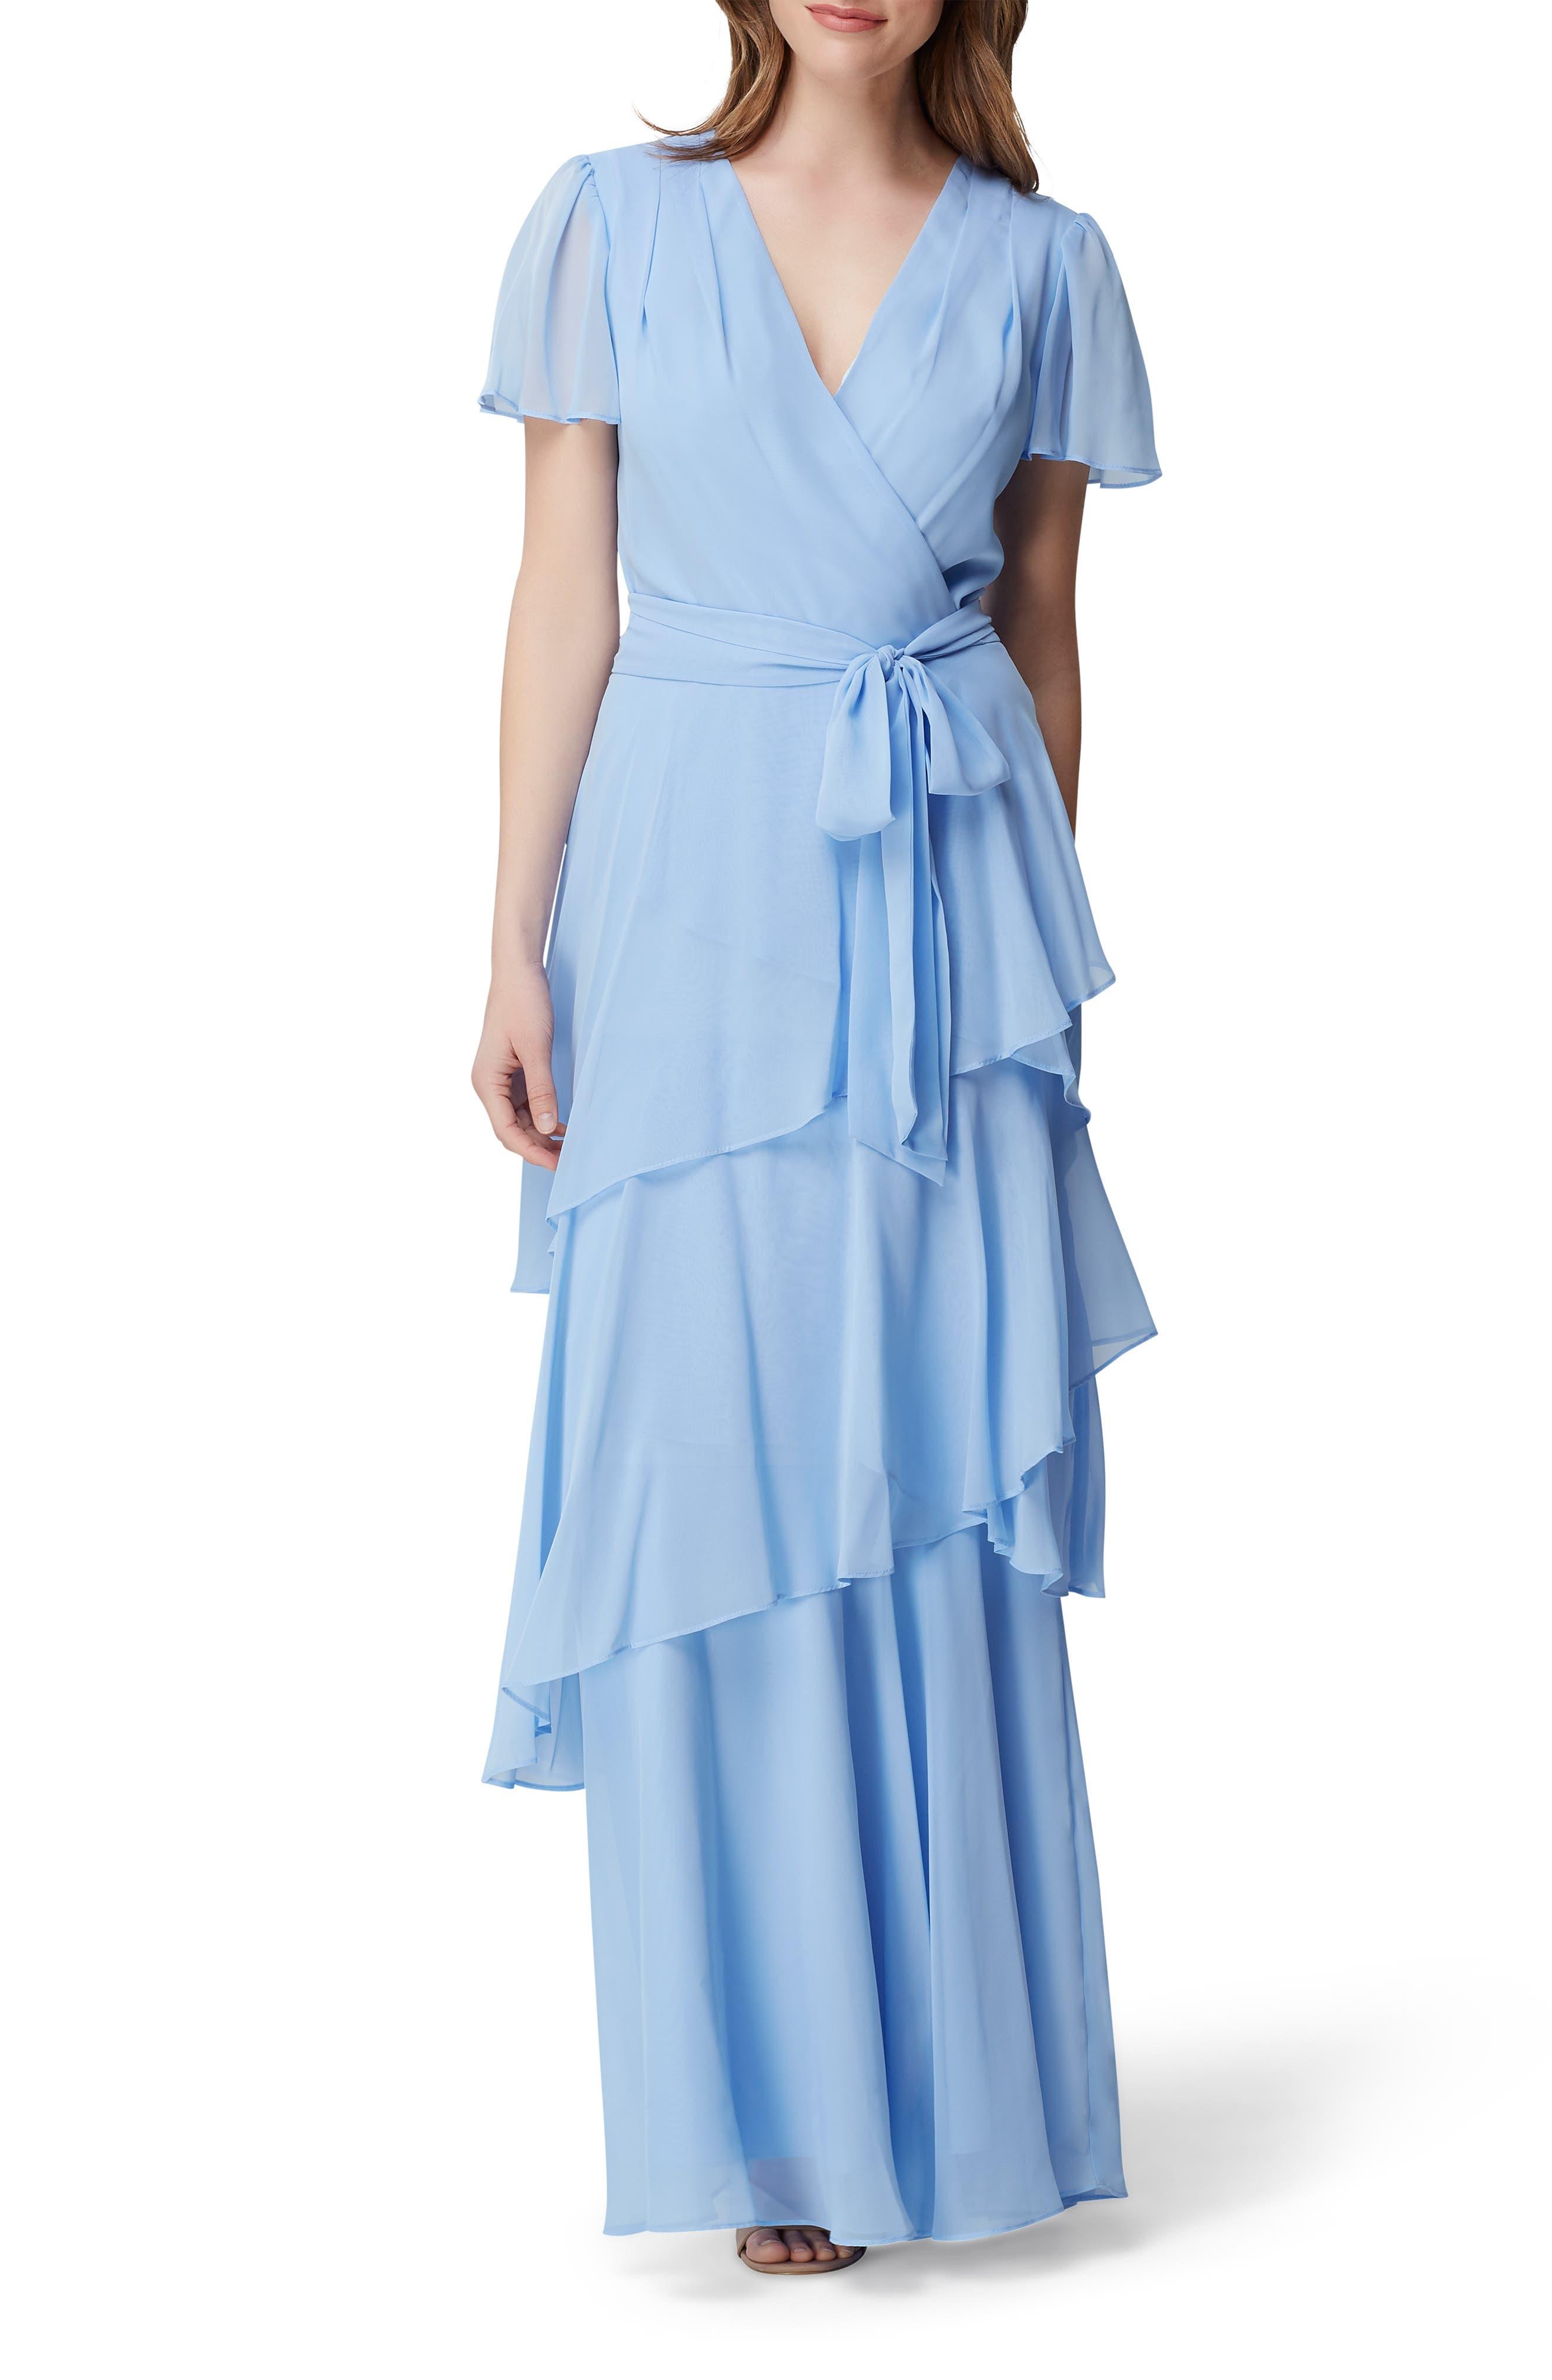 Tahari Flutter Sleeve Tiered Ruffle Chiffon Evening Gown, Blue